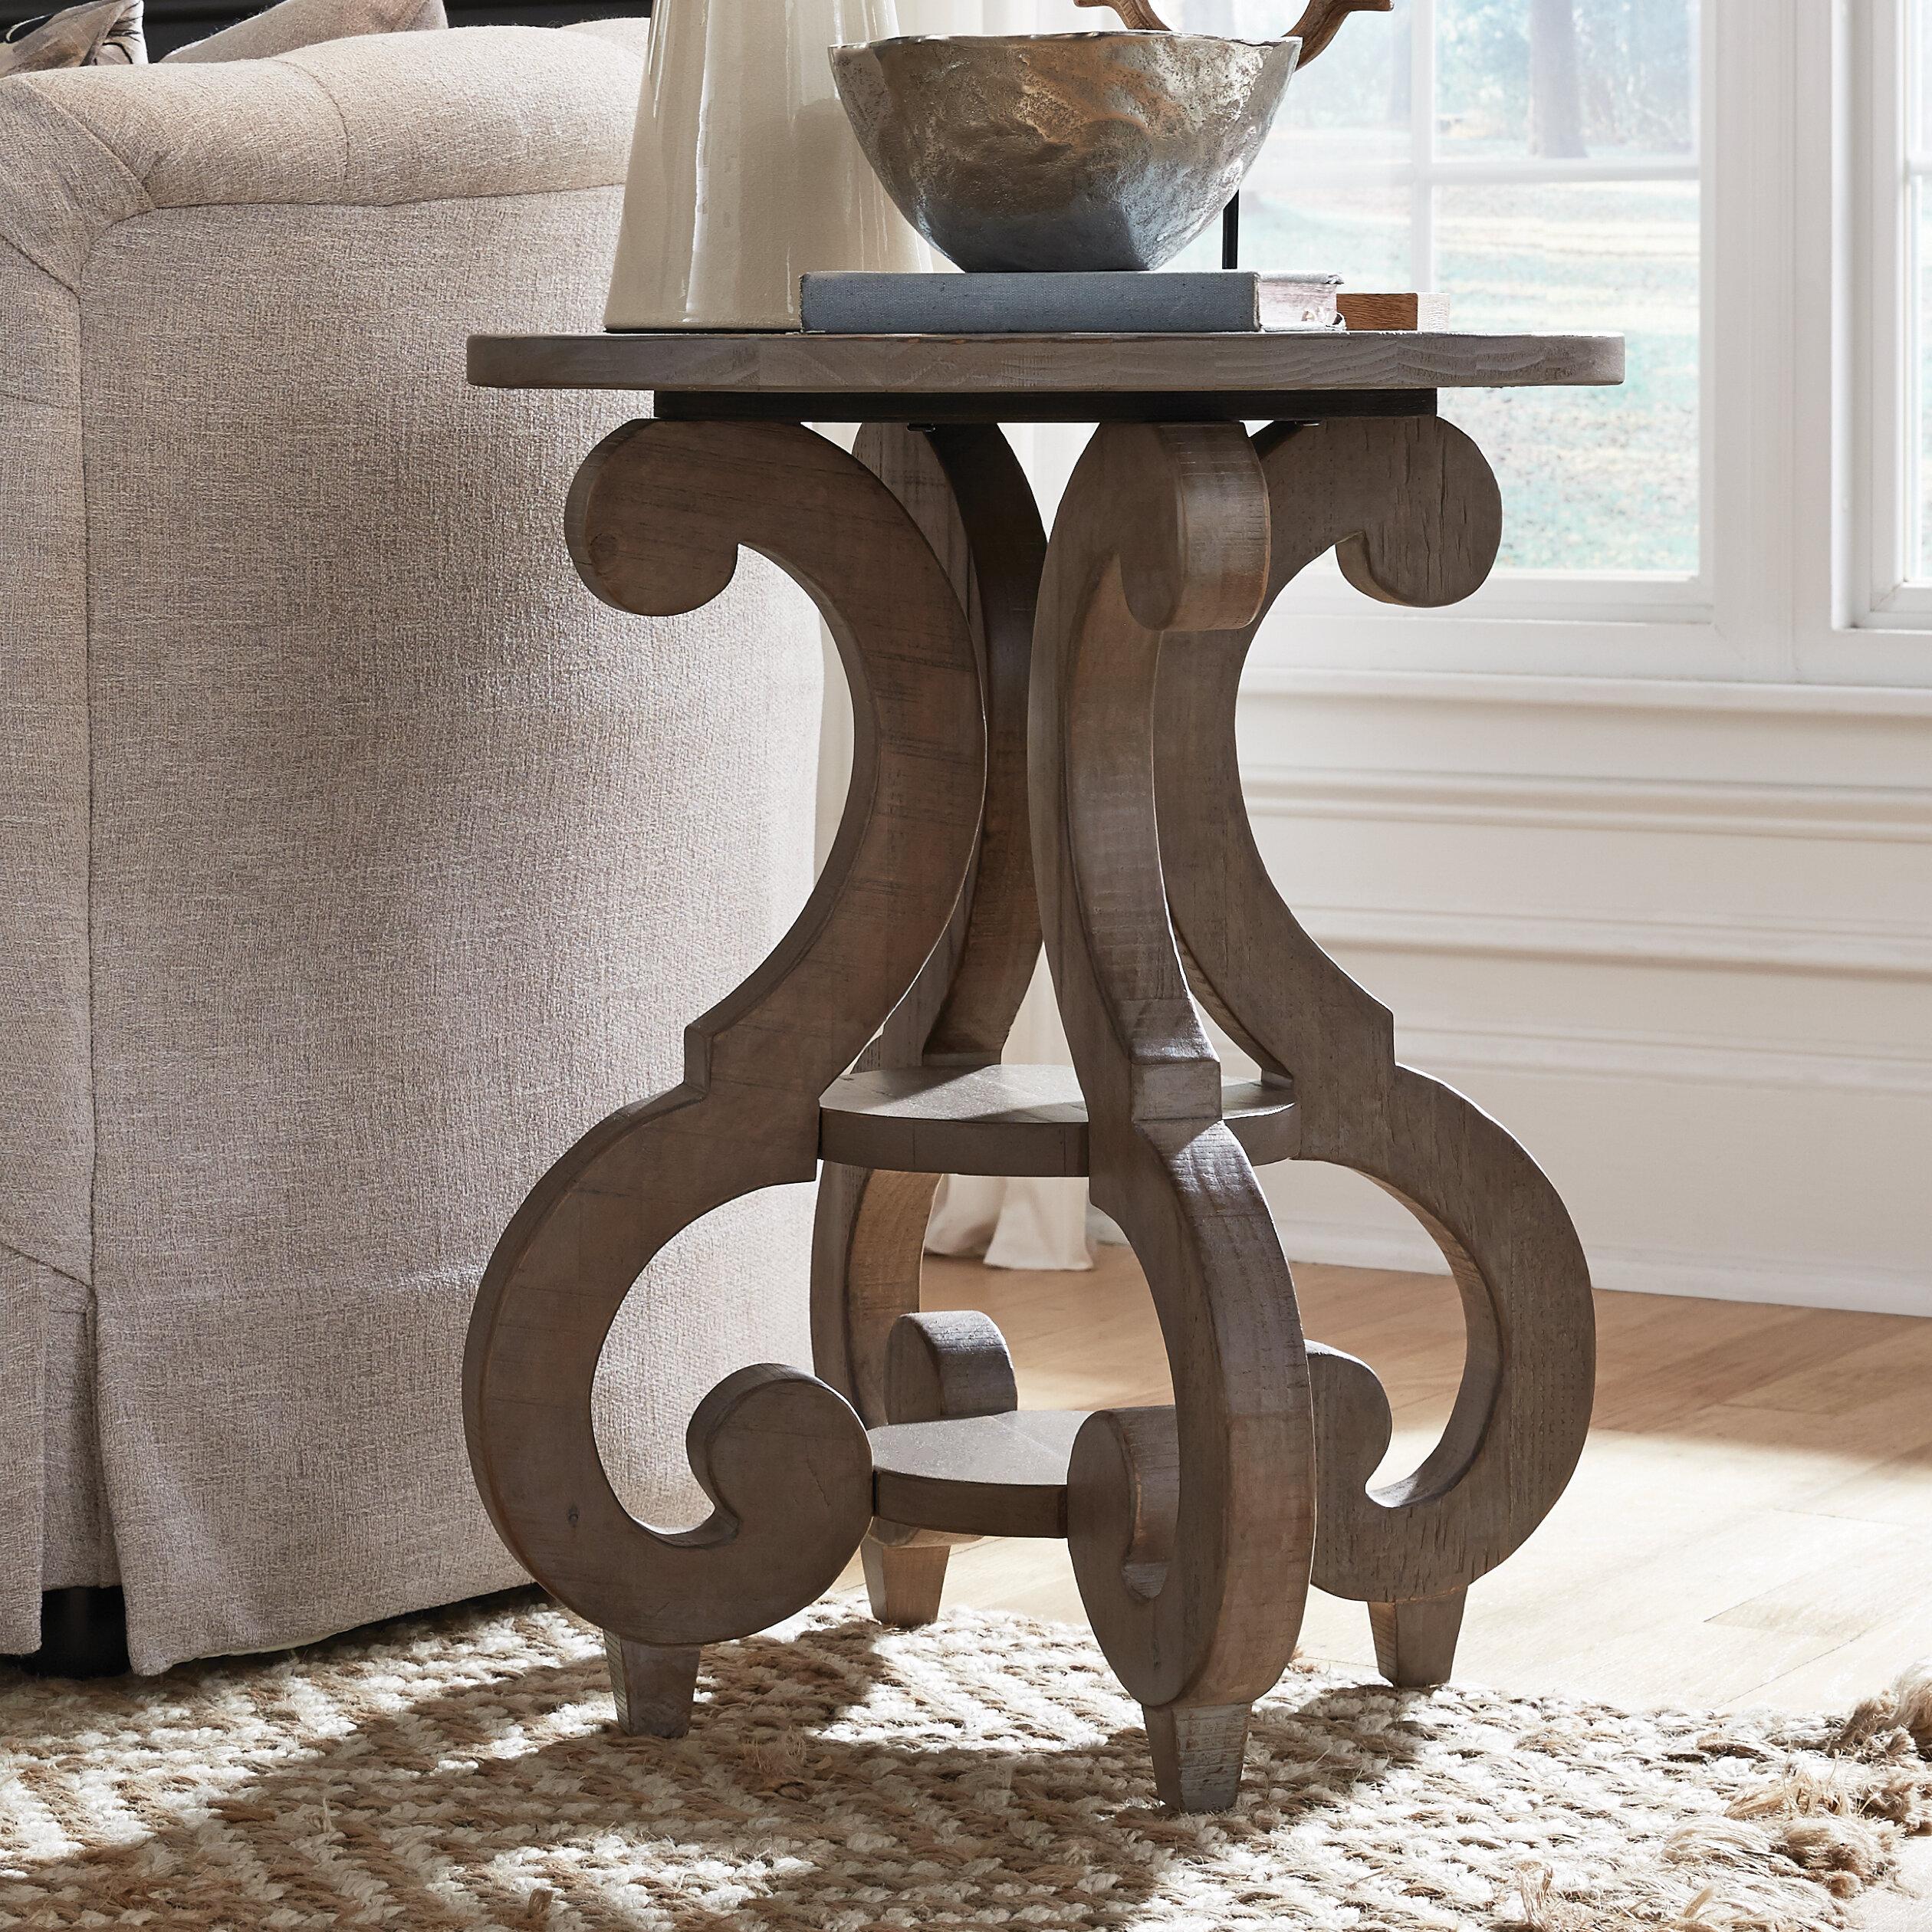 Ellenton Coffee Table With Storage: Greyleigh Ellenton End Table